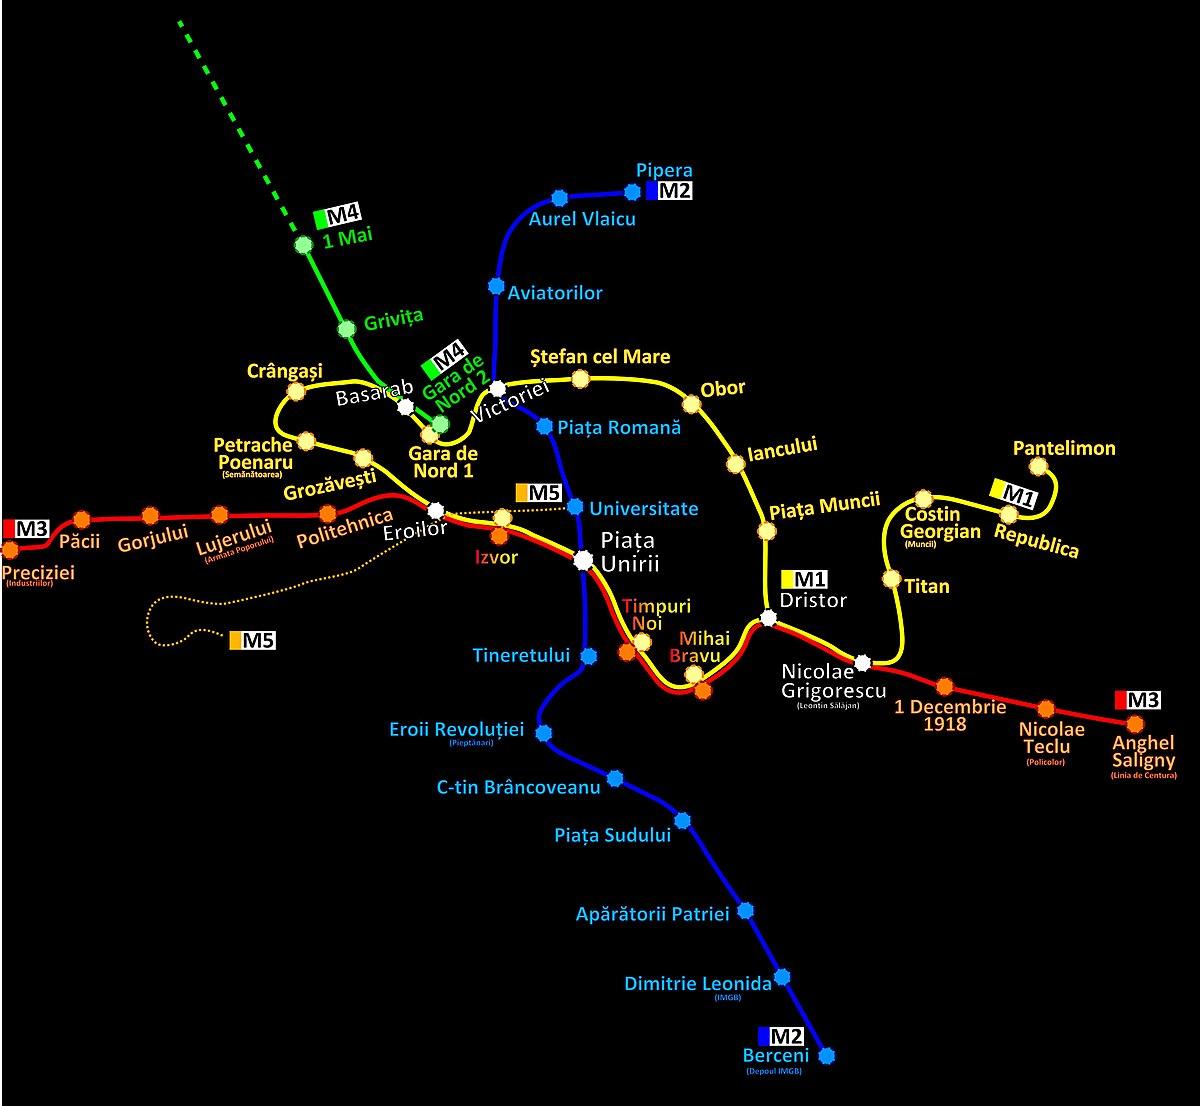 Fișier Harta Geografica Metrou Bucuresti Jpg Wikipedia